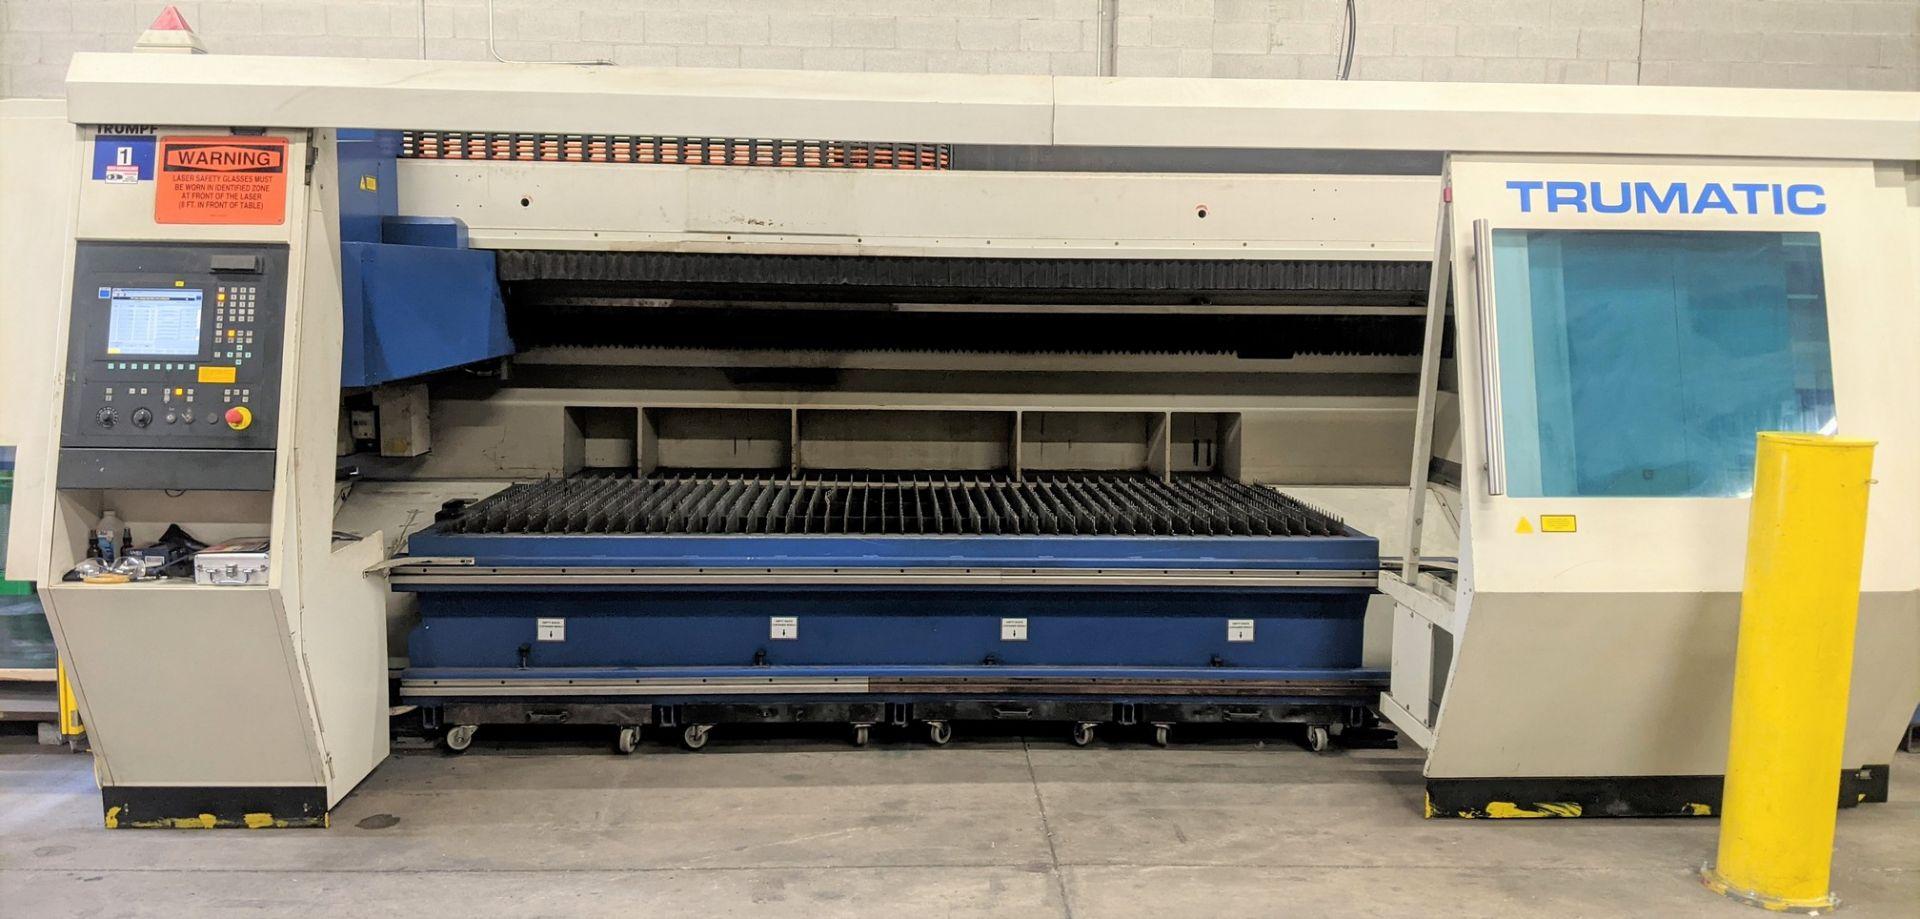 "2006 TRUMPF TRUMATIC L 2510 CNC LASER, 2,000 WATT, 4' X 10' TABLE, TRAVELS: X-120"", Y-50"", Z- - Image 8 of 32"